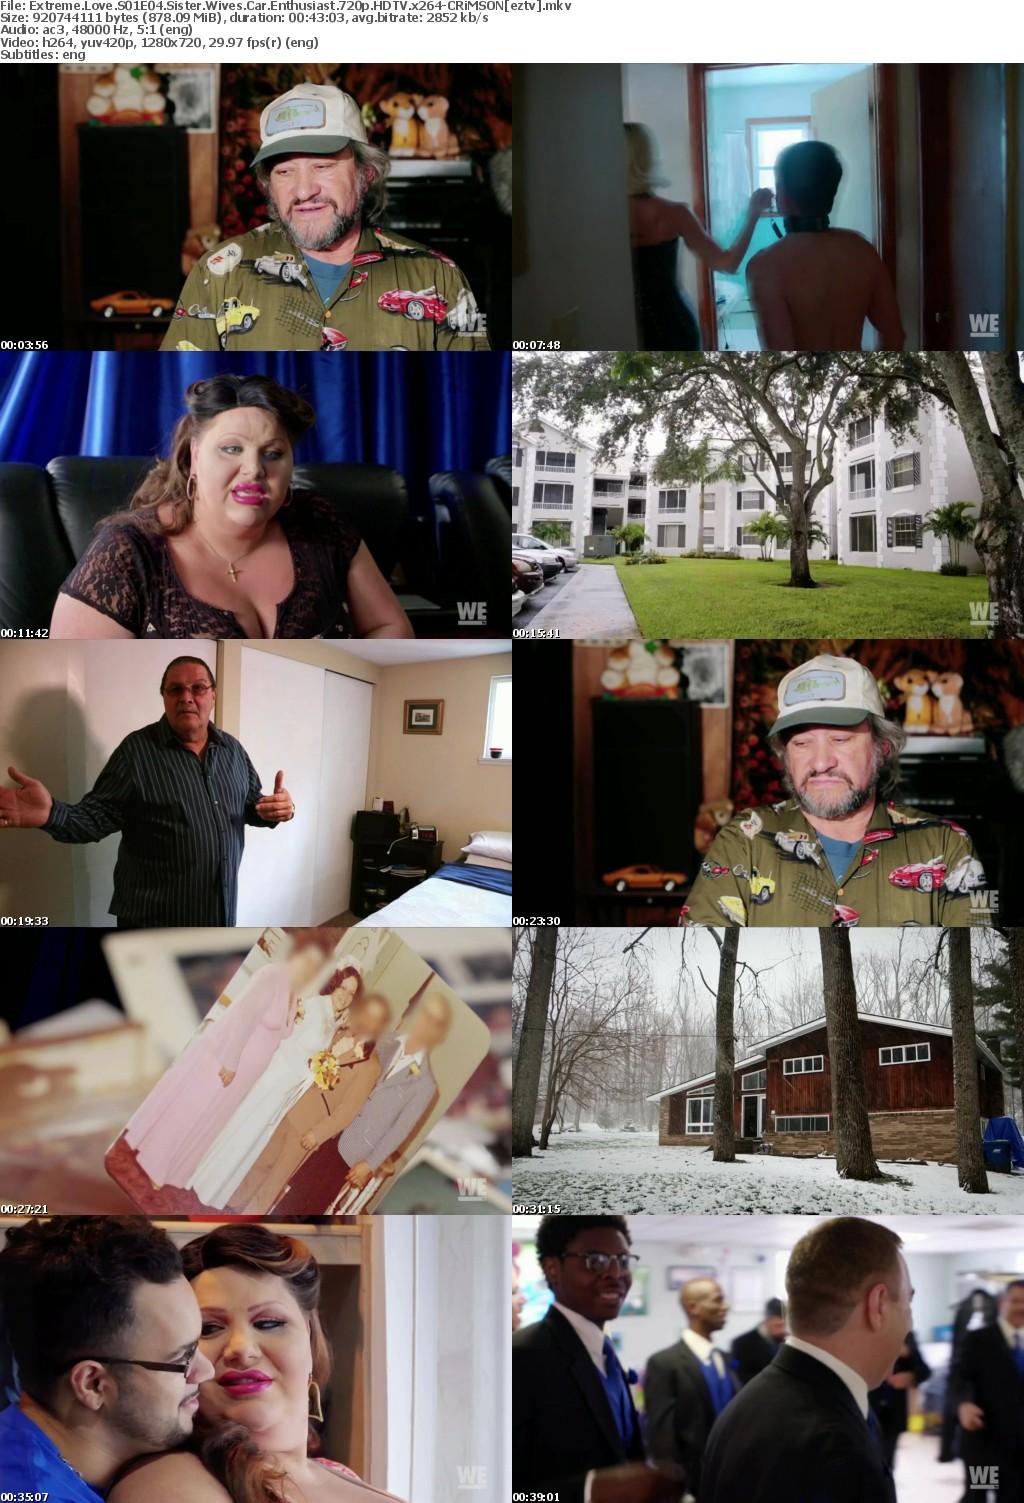 Extreme Love S01E04 Sister Wives Car Enthusiast 720p HDTV x264-CRiMSON